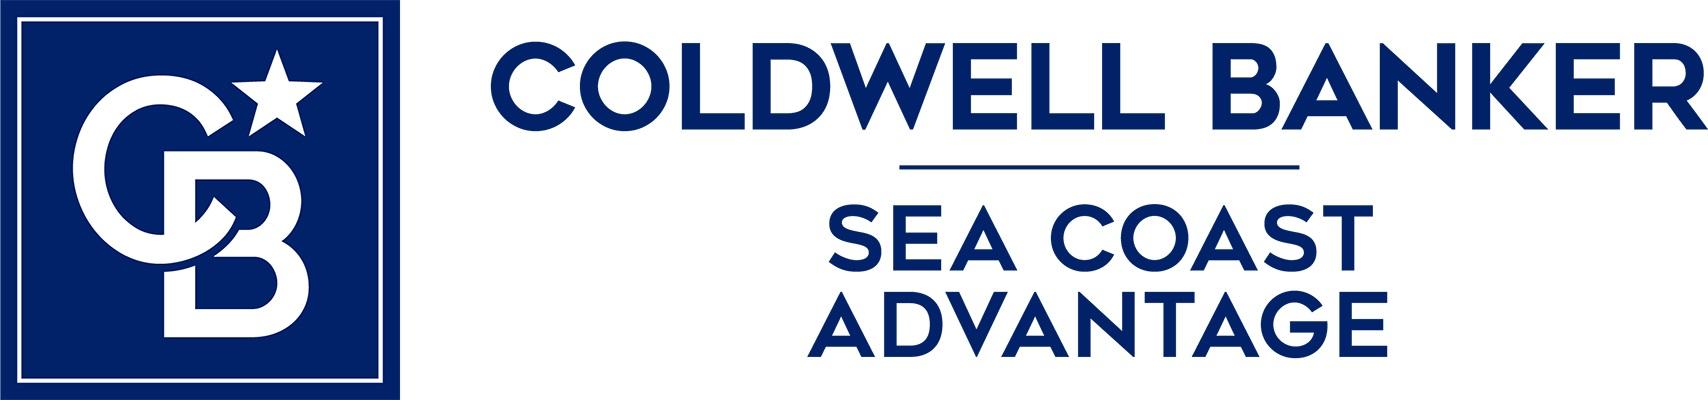 Dana King - Coldwell Banker Sea Coast Advantage Realty Logo